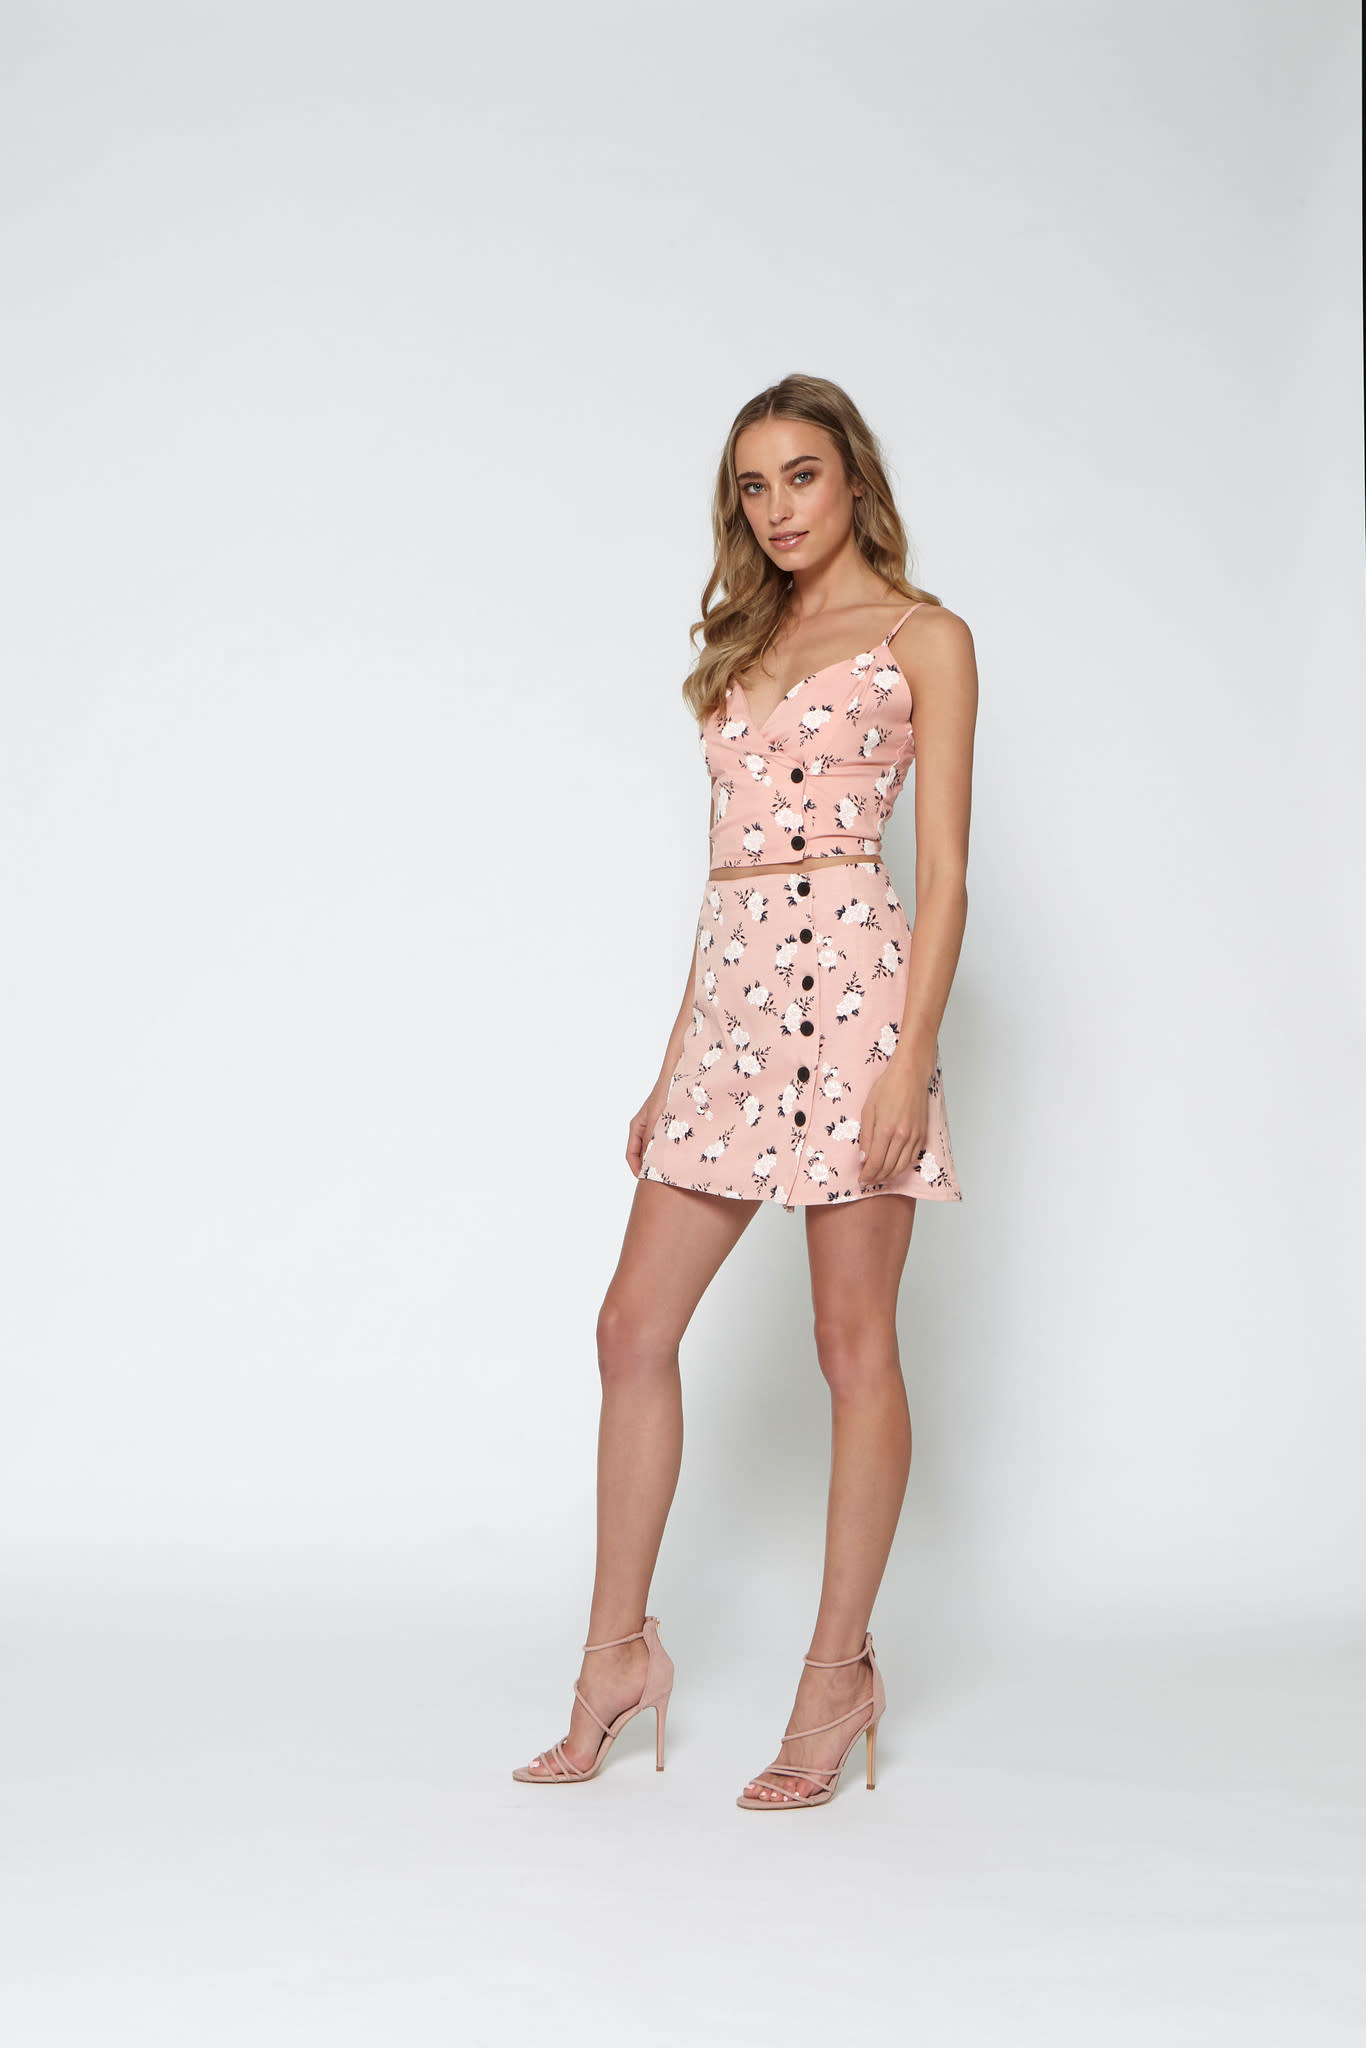 Lofty Manner Top estee MC18.1 pink